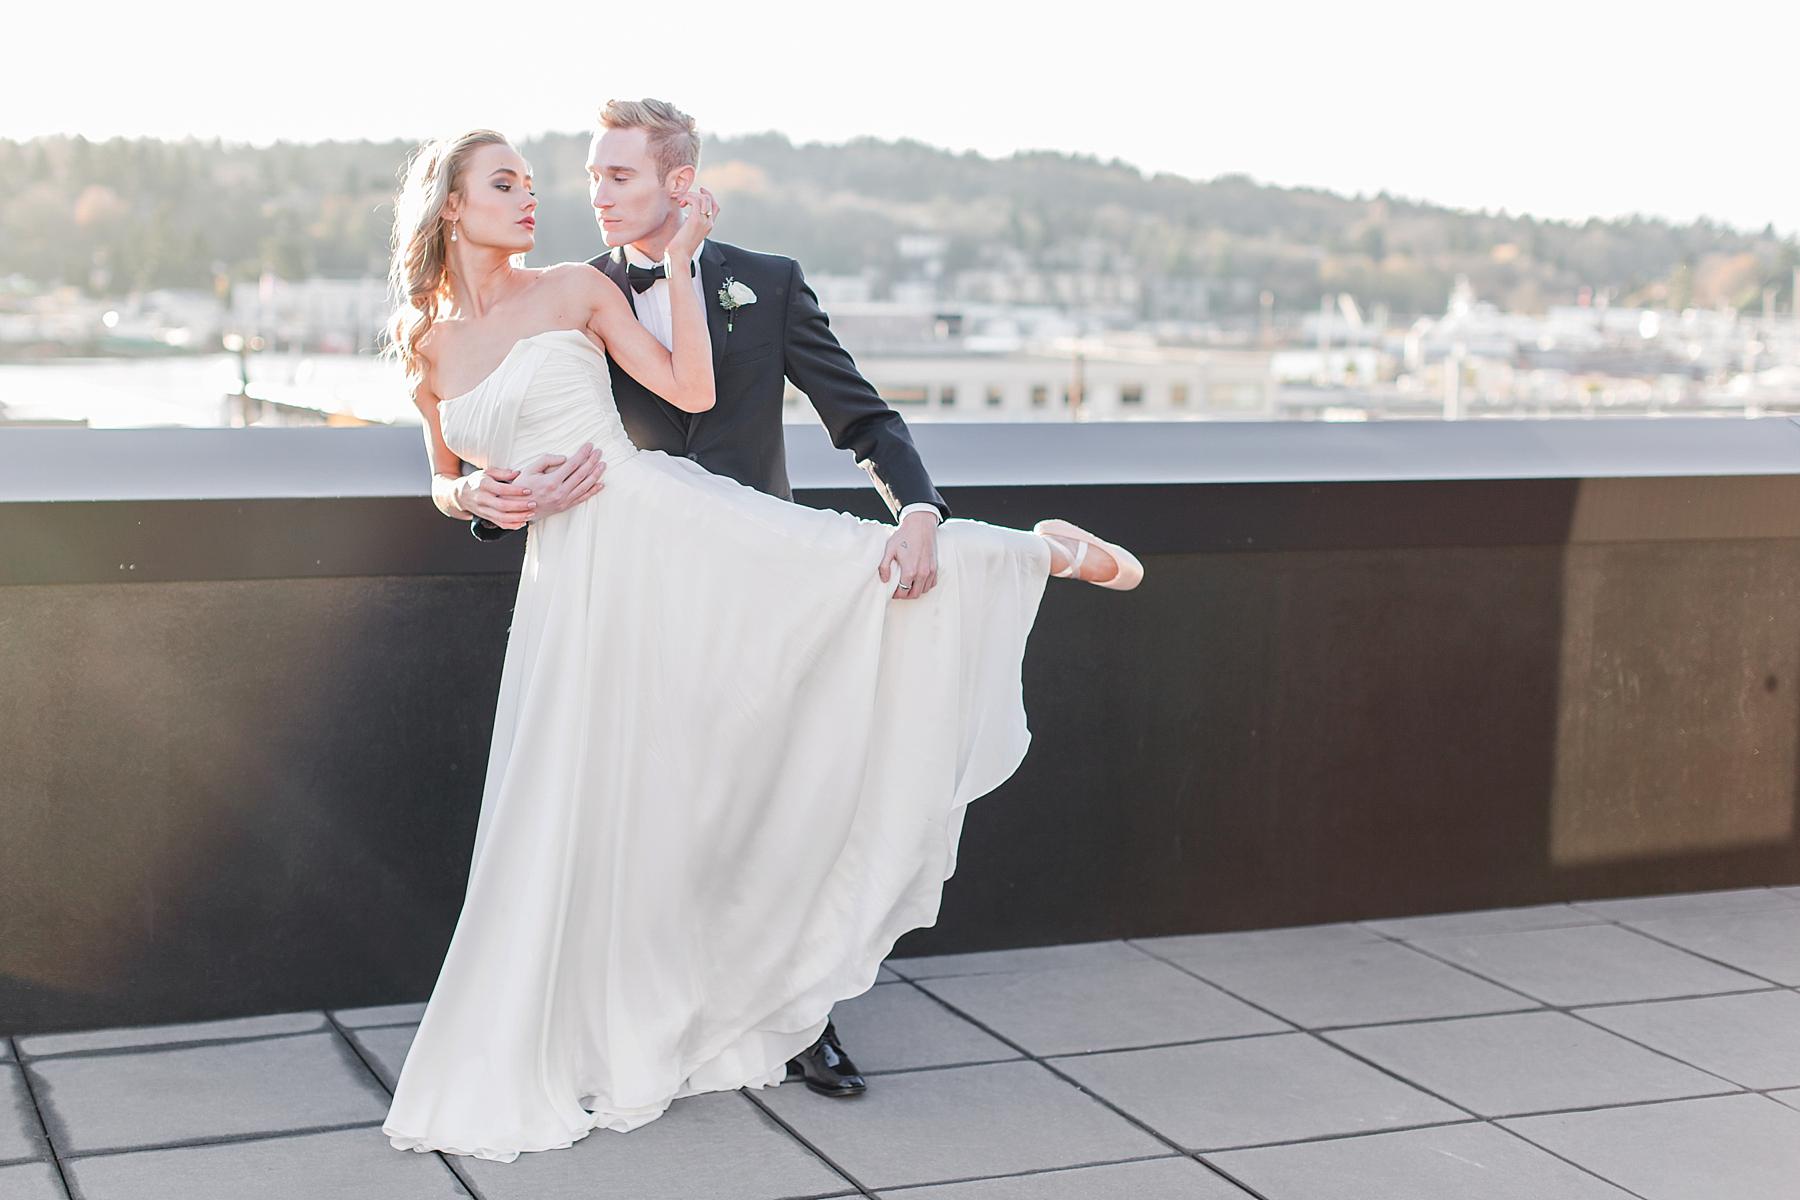 black-white-ballet-masquerade-wedding-35.jpg